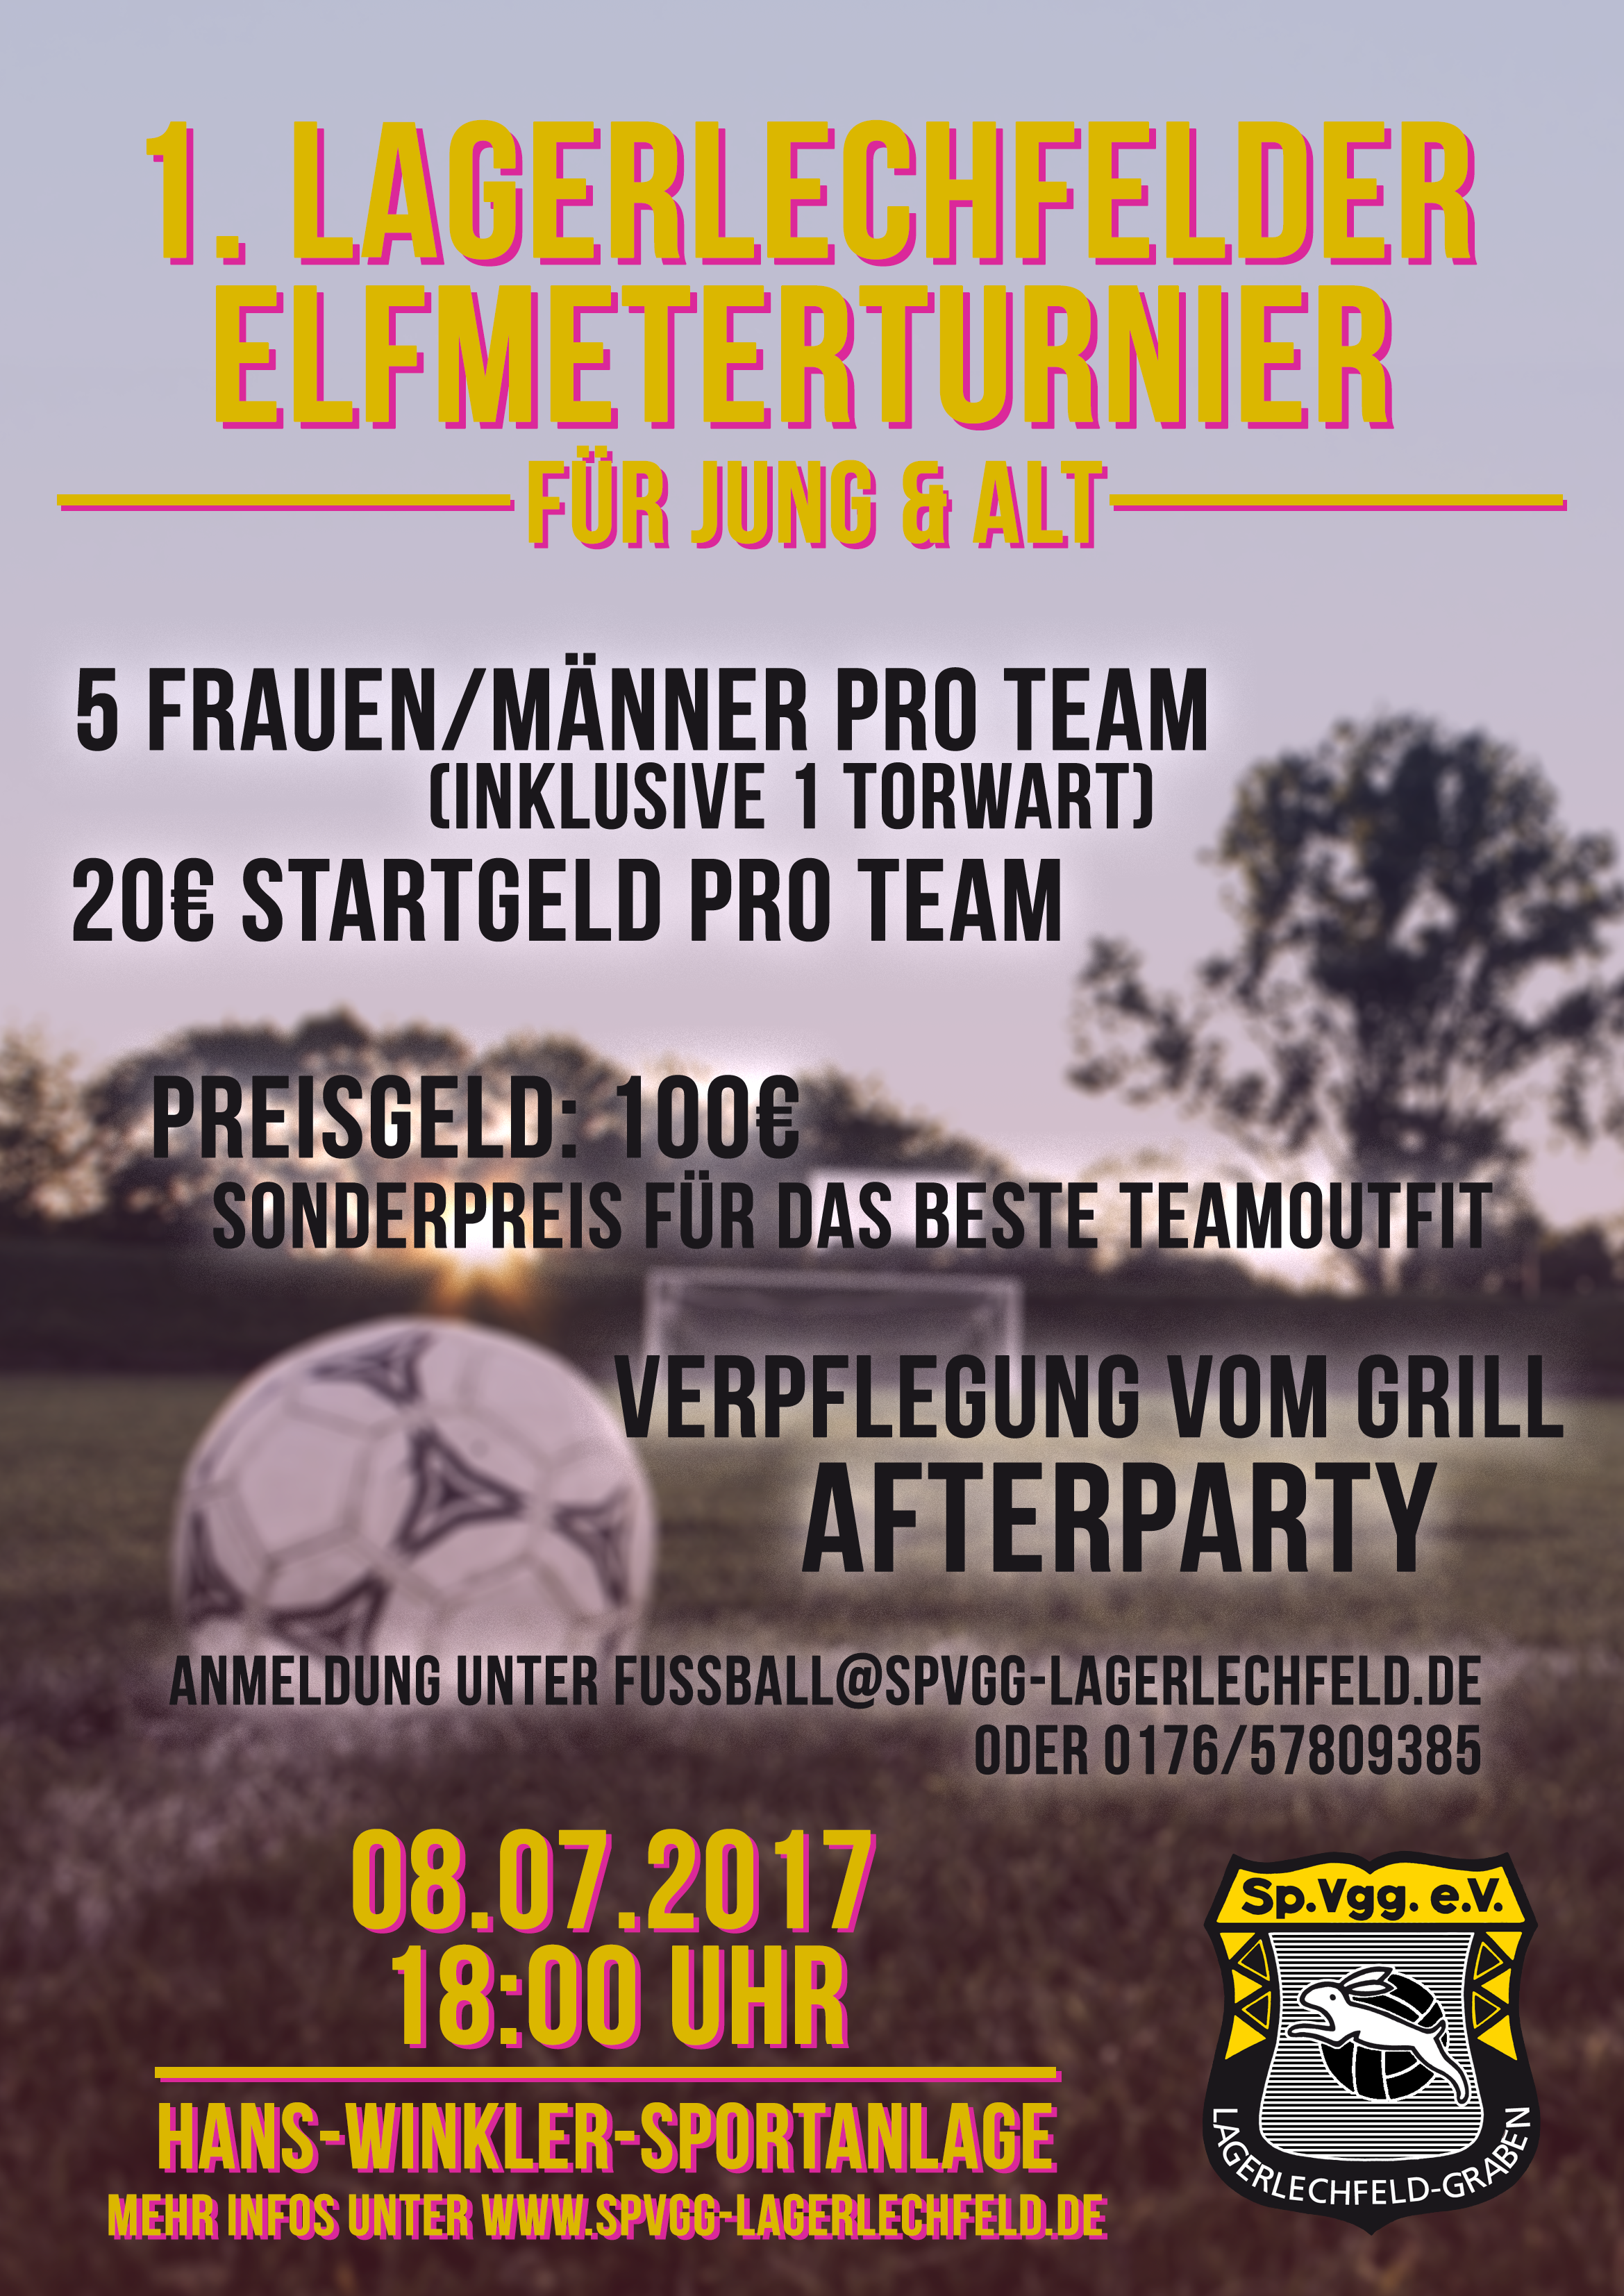 FLYER-Elfmeterturnier